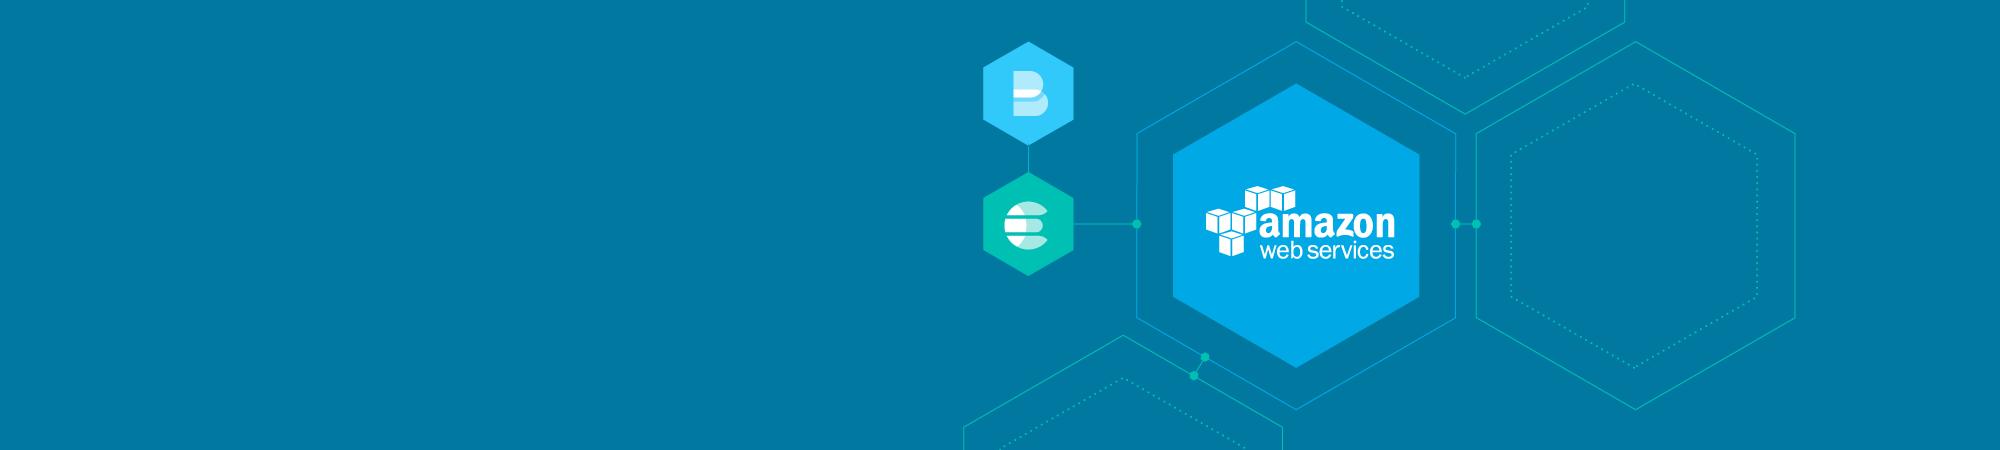 Using Beats with Amazon AWS | Elastic Blog